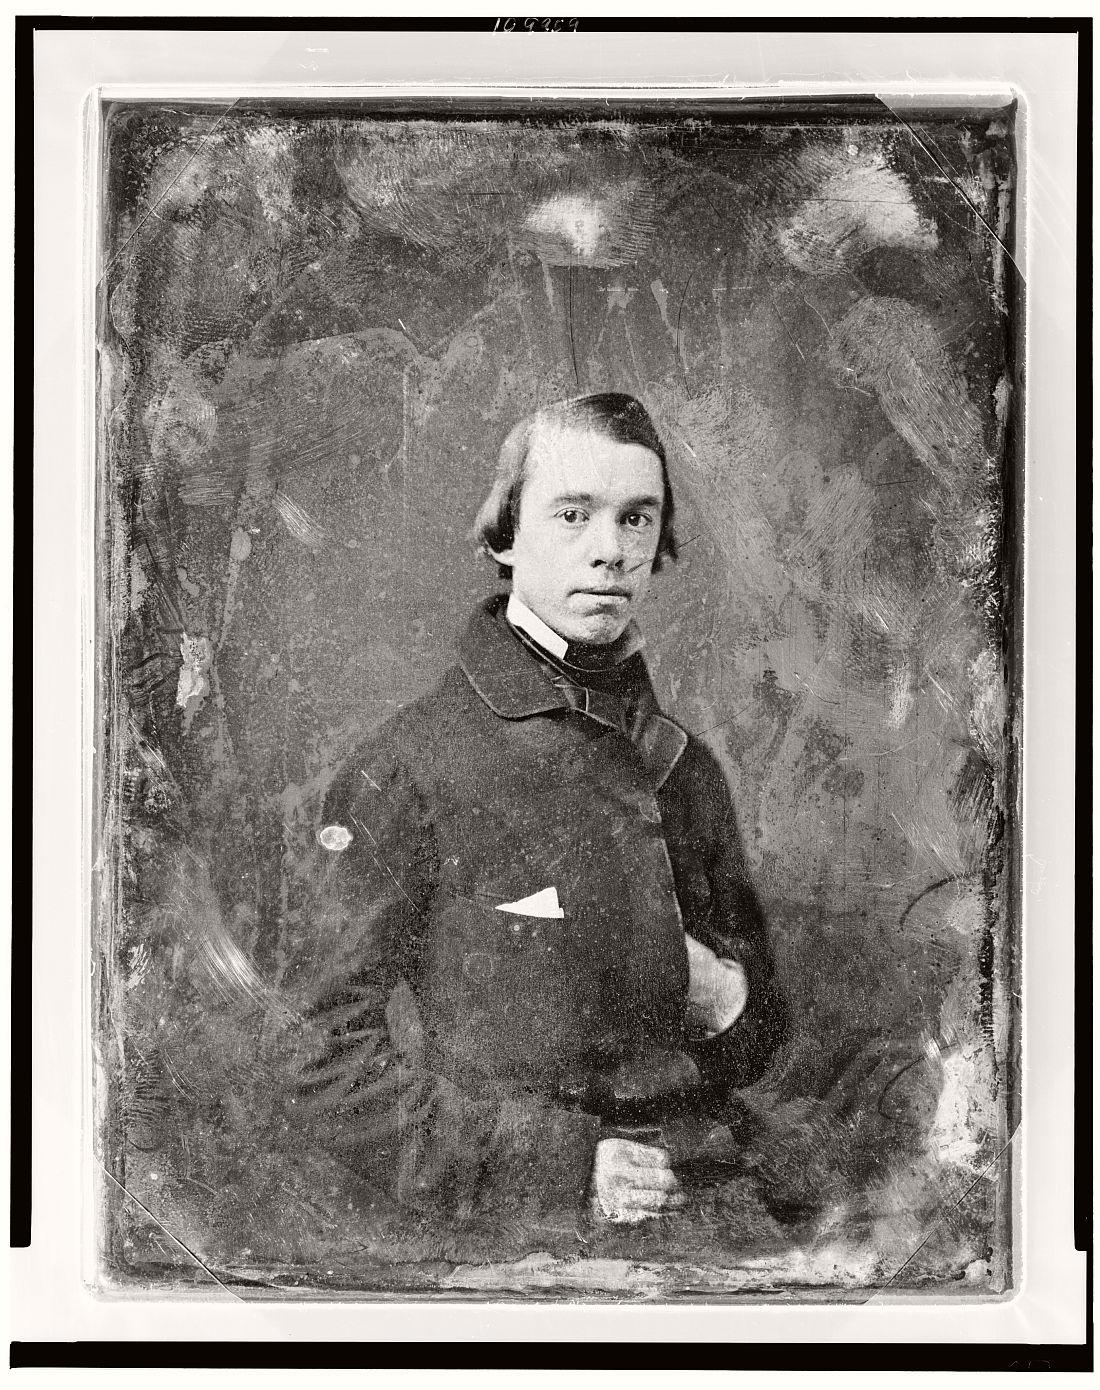 vintage-daguerreotype-portraits-from-xix-century-1844-1860-35